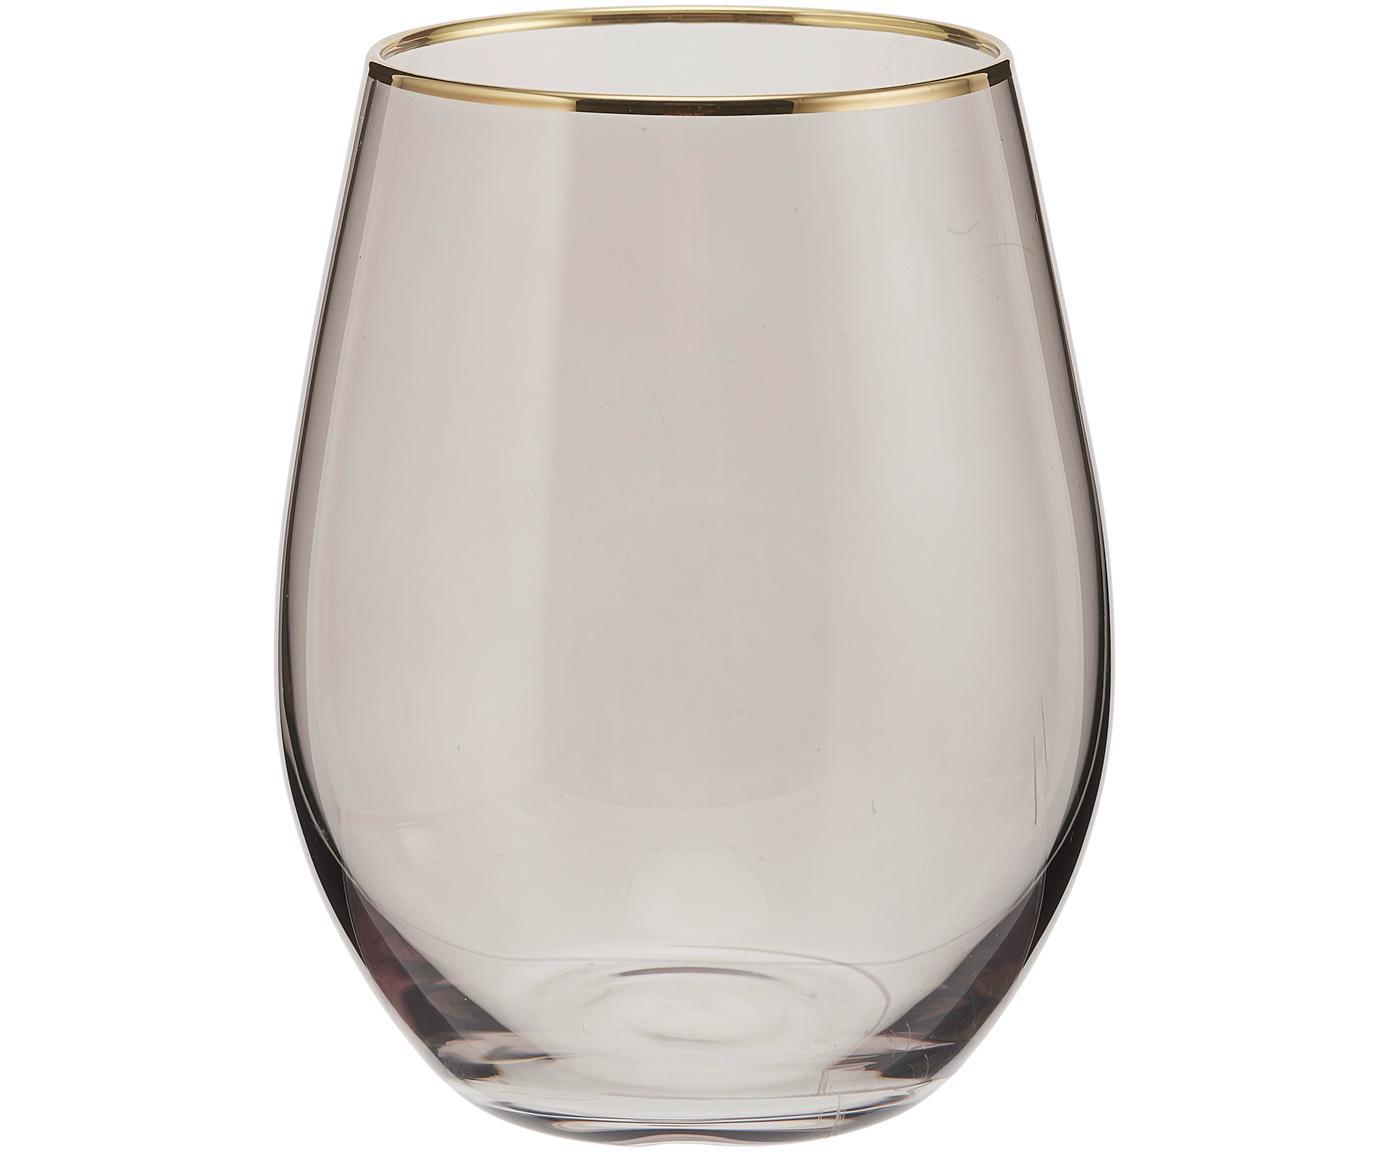 Waterglazen Chloe, 4 stuks, Glas, Donkerblauw, goudkleurig, Ø 10 x H 15 cm